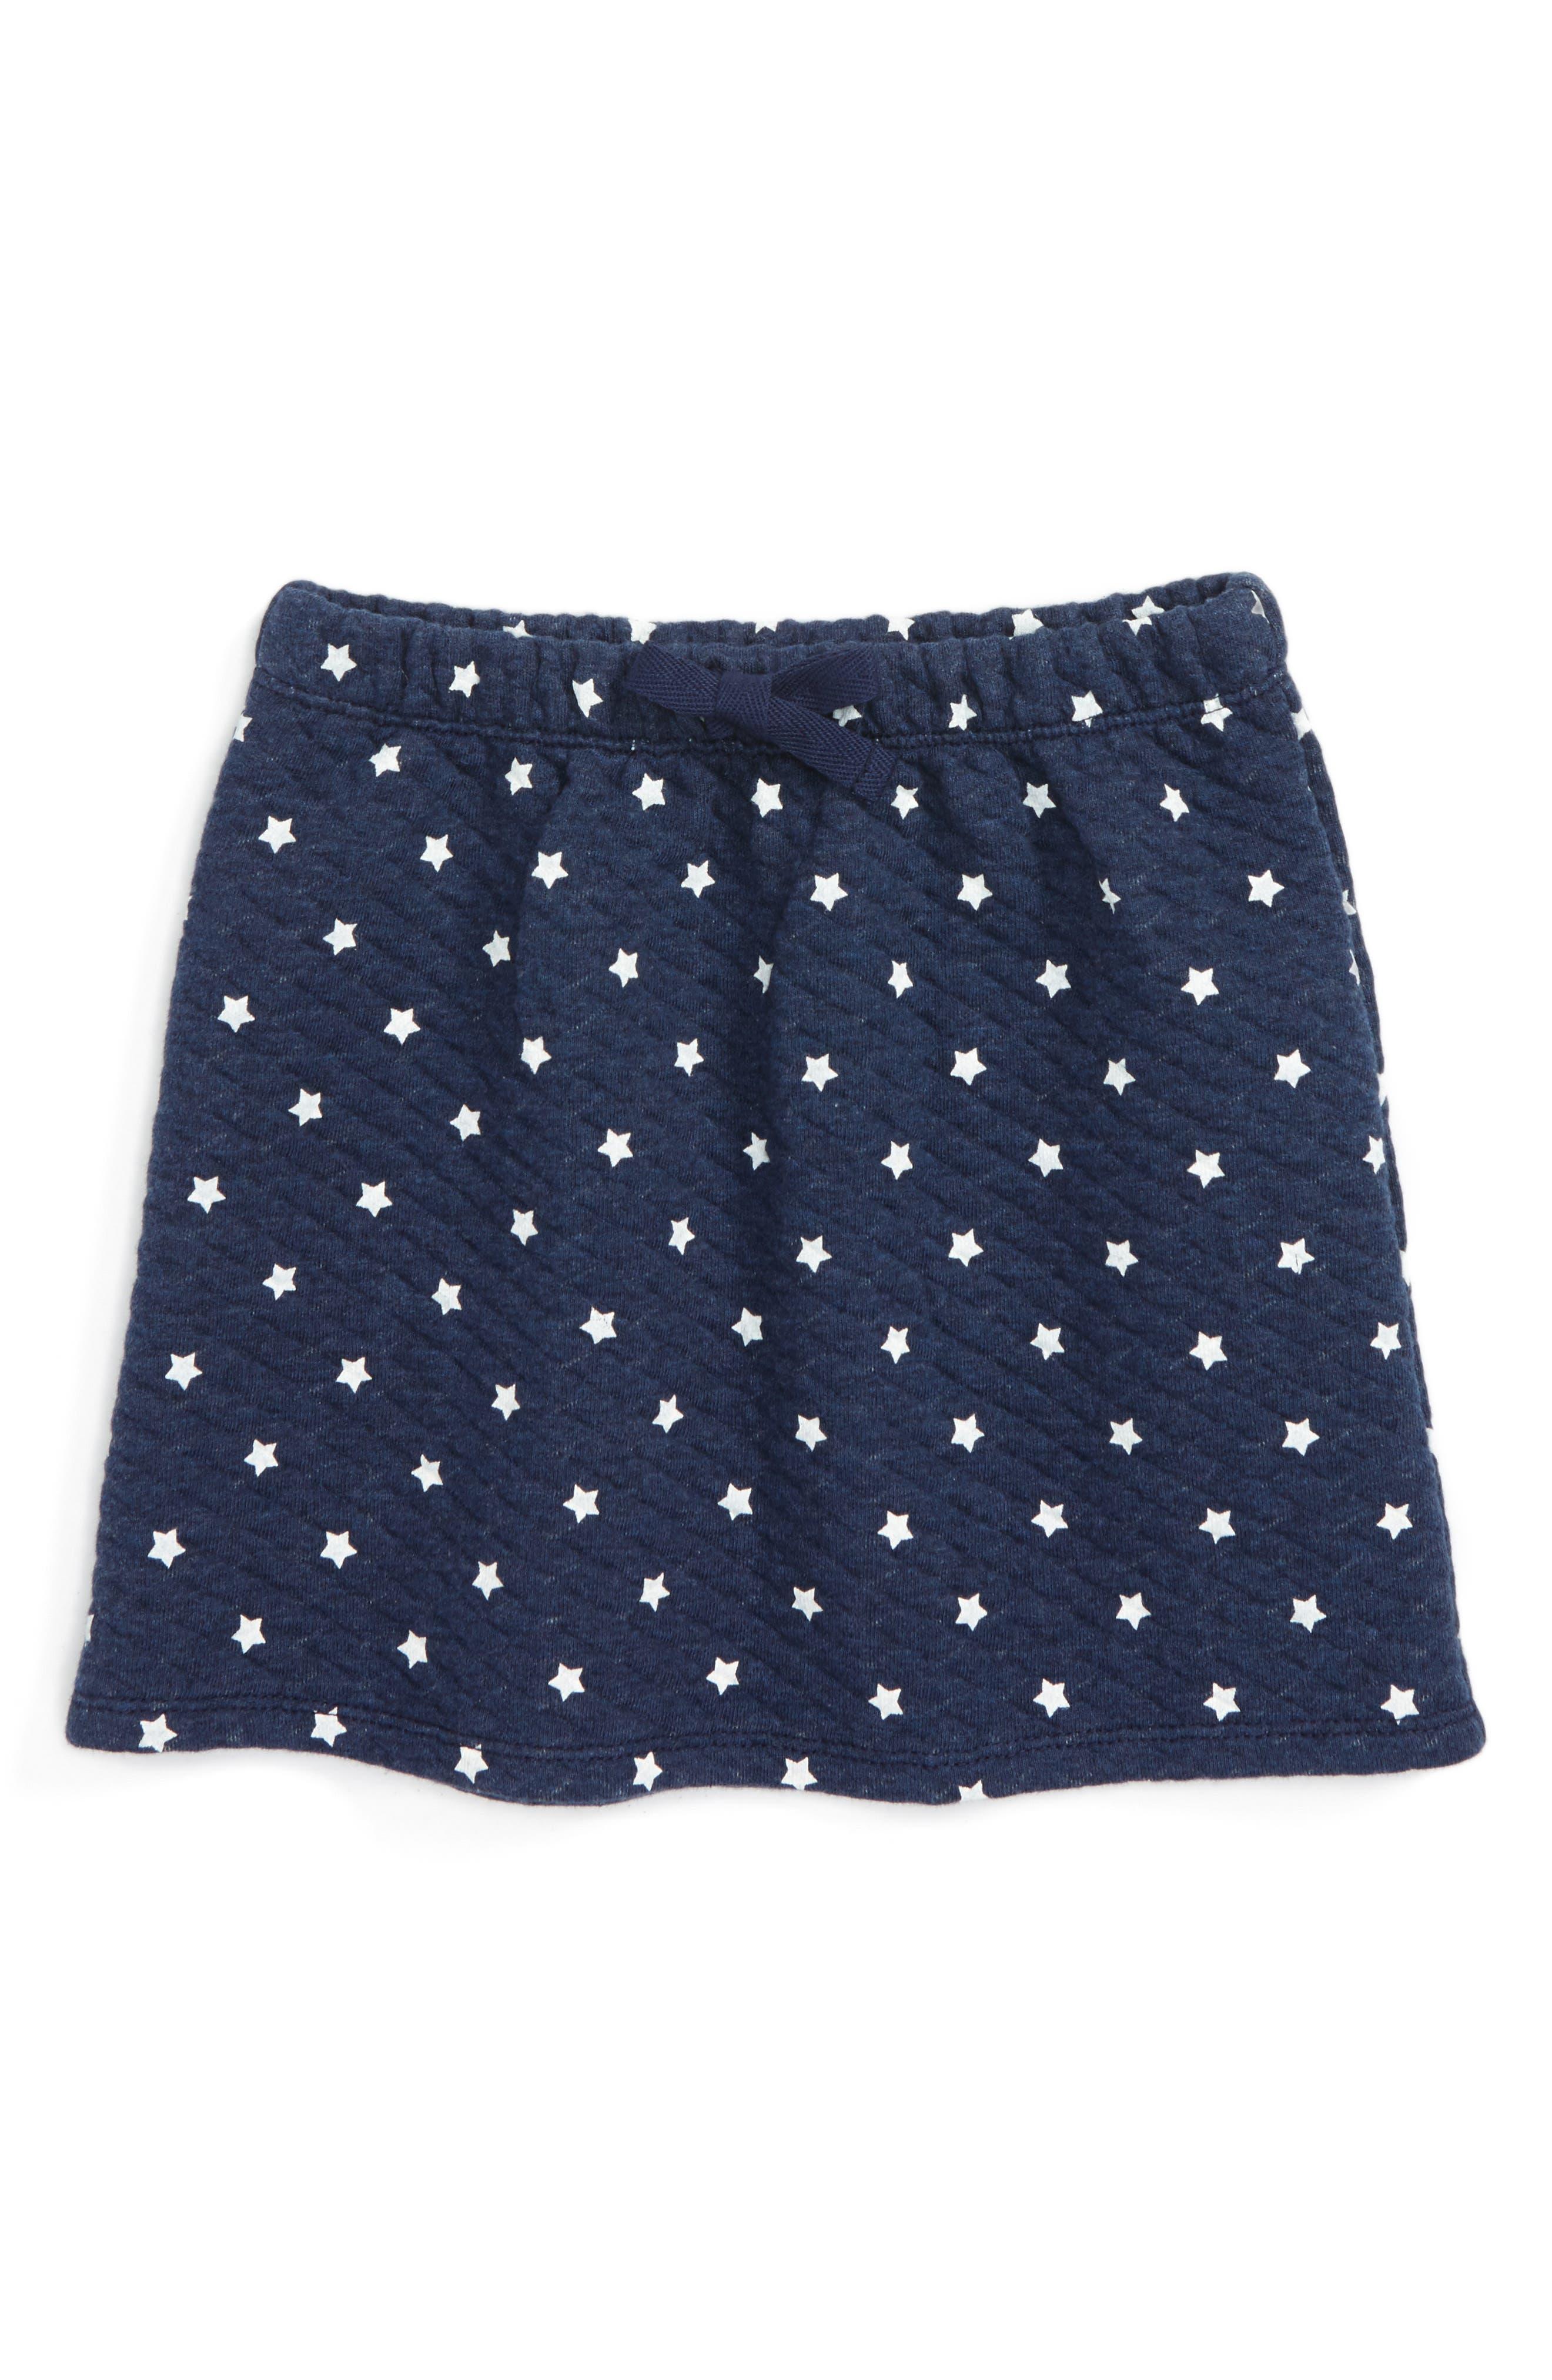 Main Image - Tucker + Tate Thea Star Skirt (Toddler Girls, Little Girls & Big Girls)